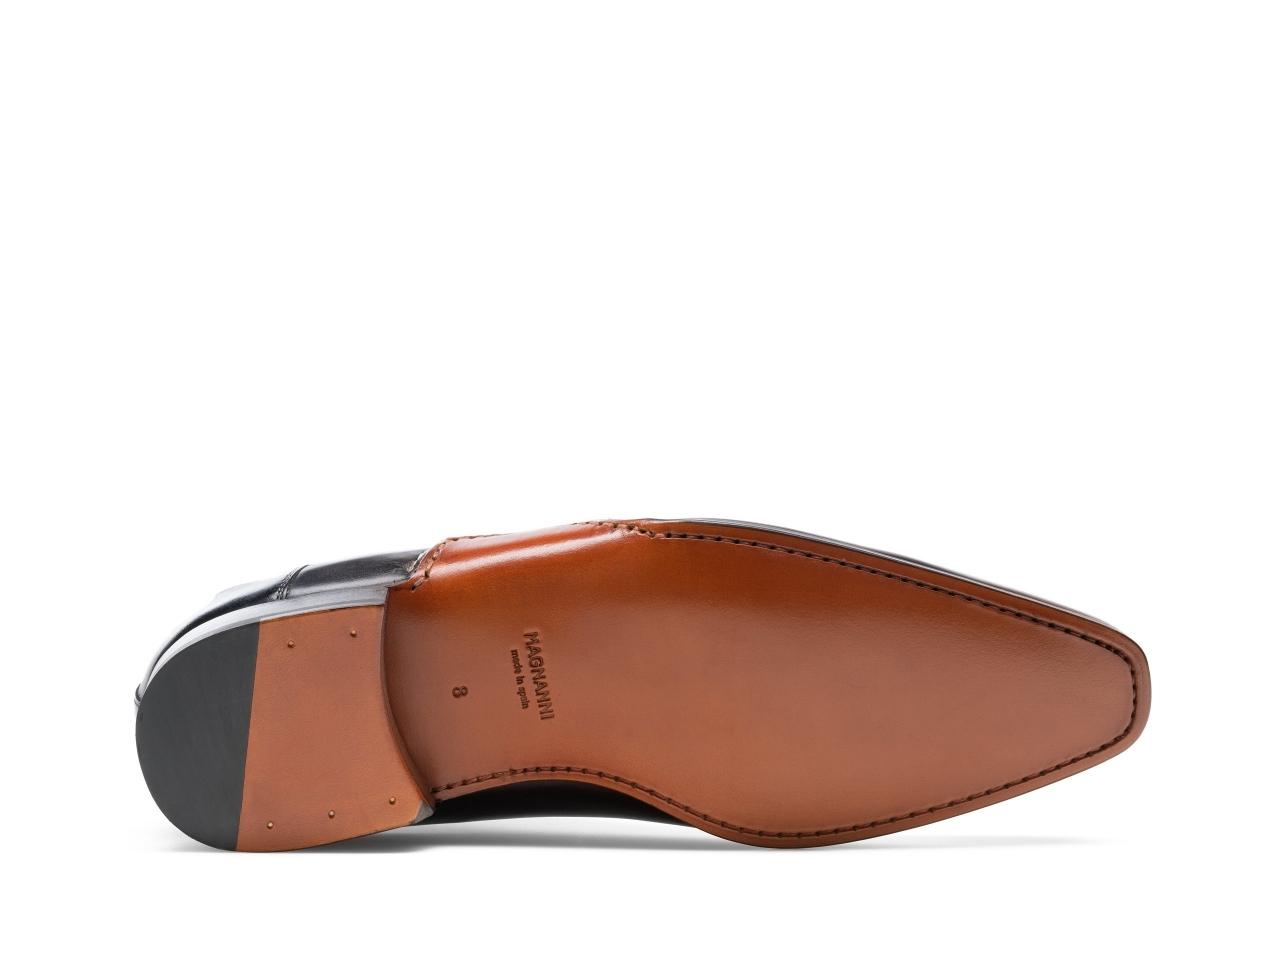 The sole of the Nero